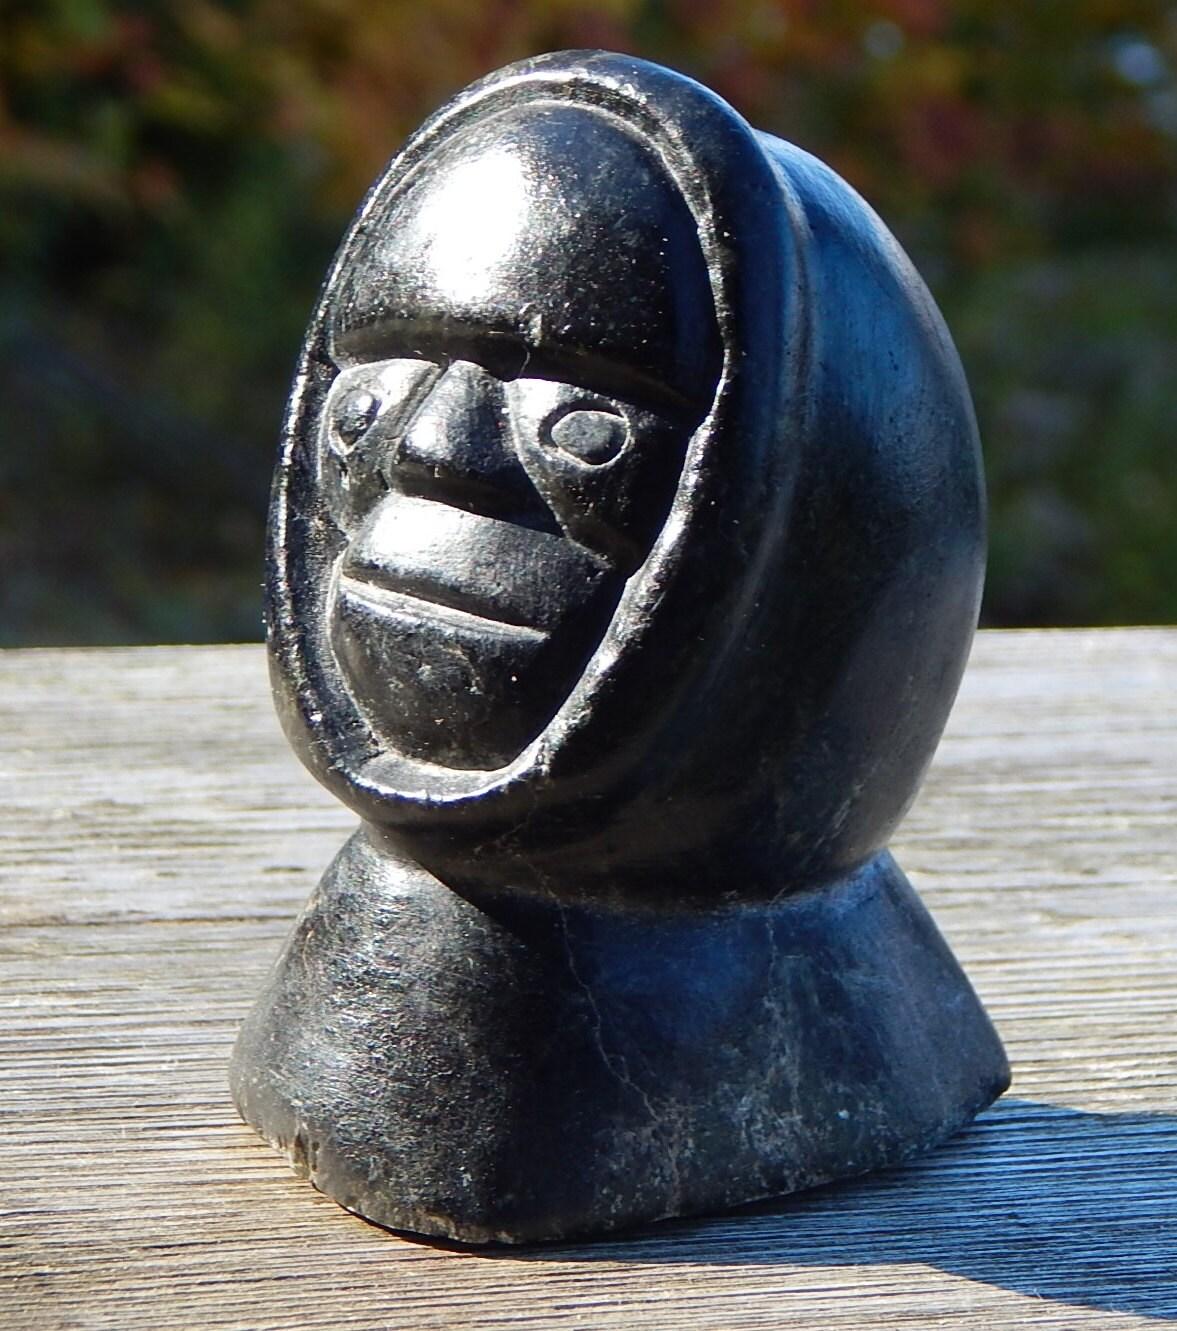 Inuit Eskimo Soapstone Carving Of Woman: Inuit Eskimo Soapstone Art Carving: HEAD About 4 By